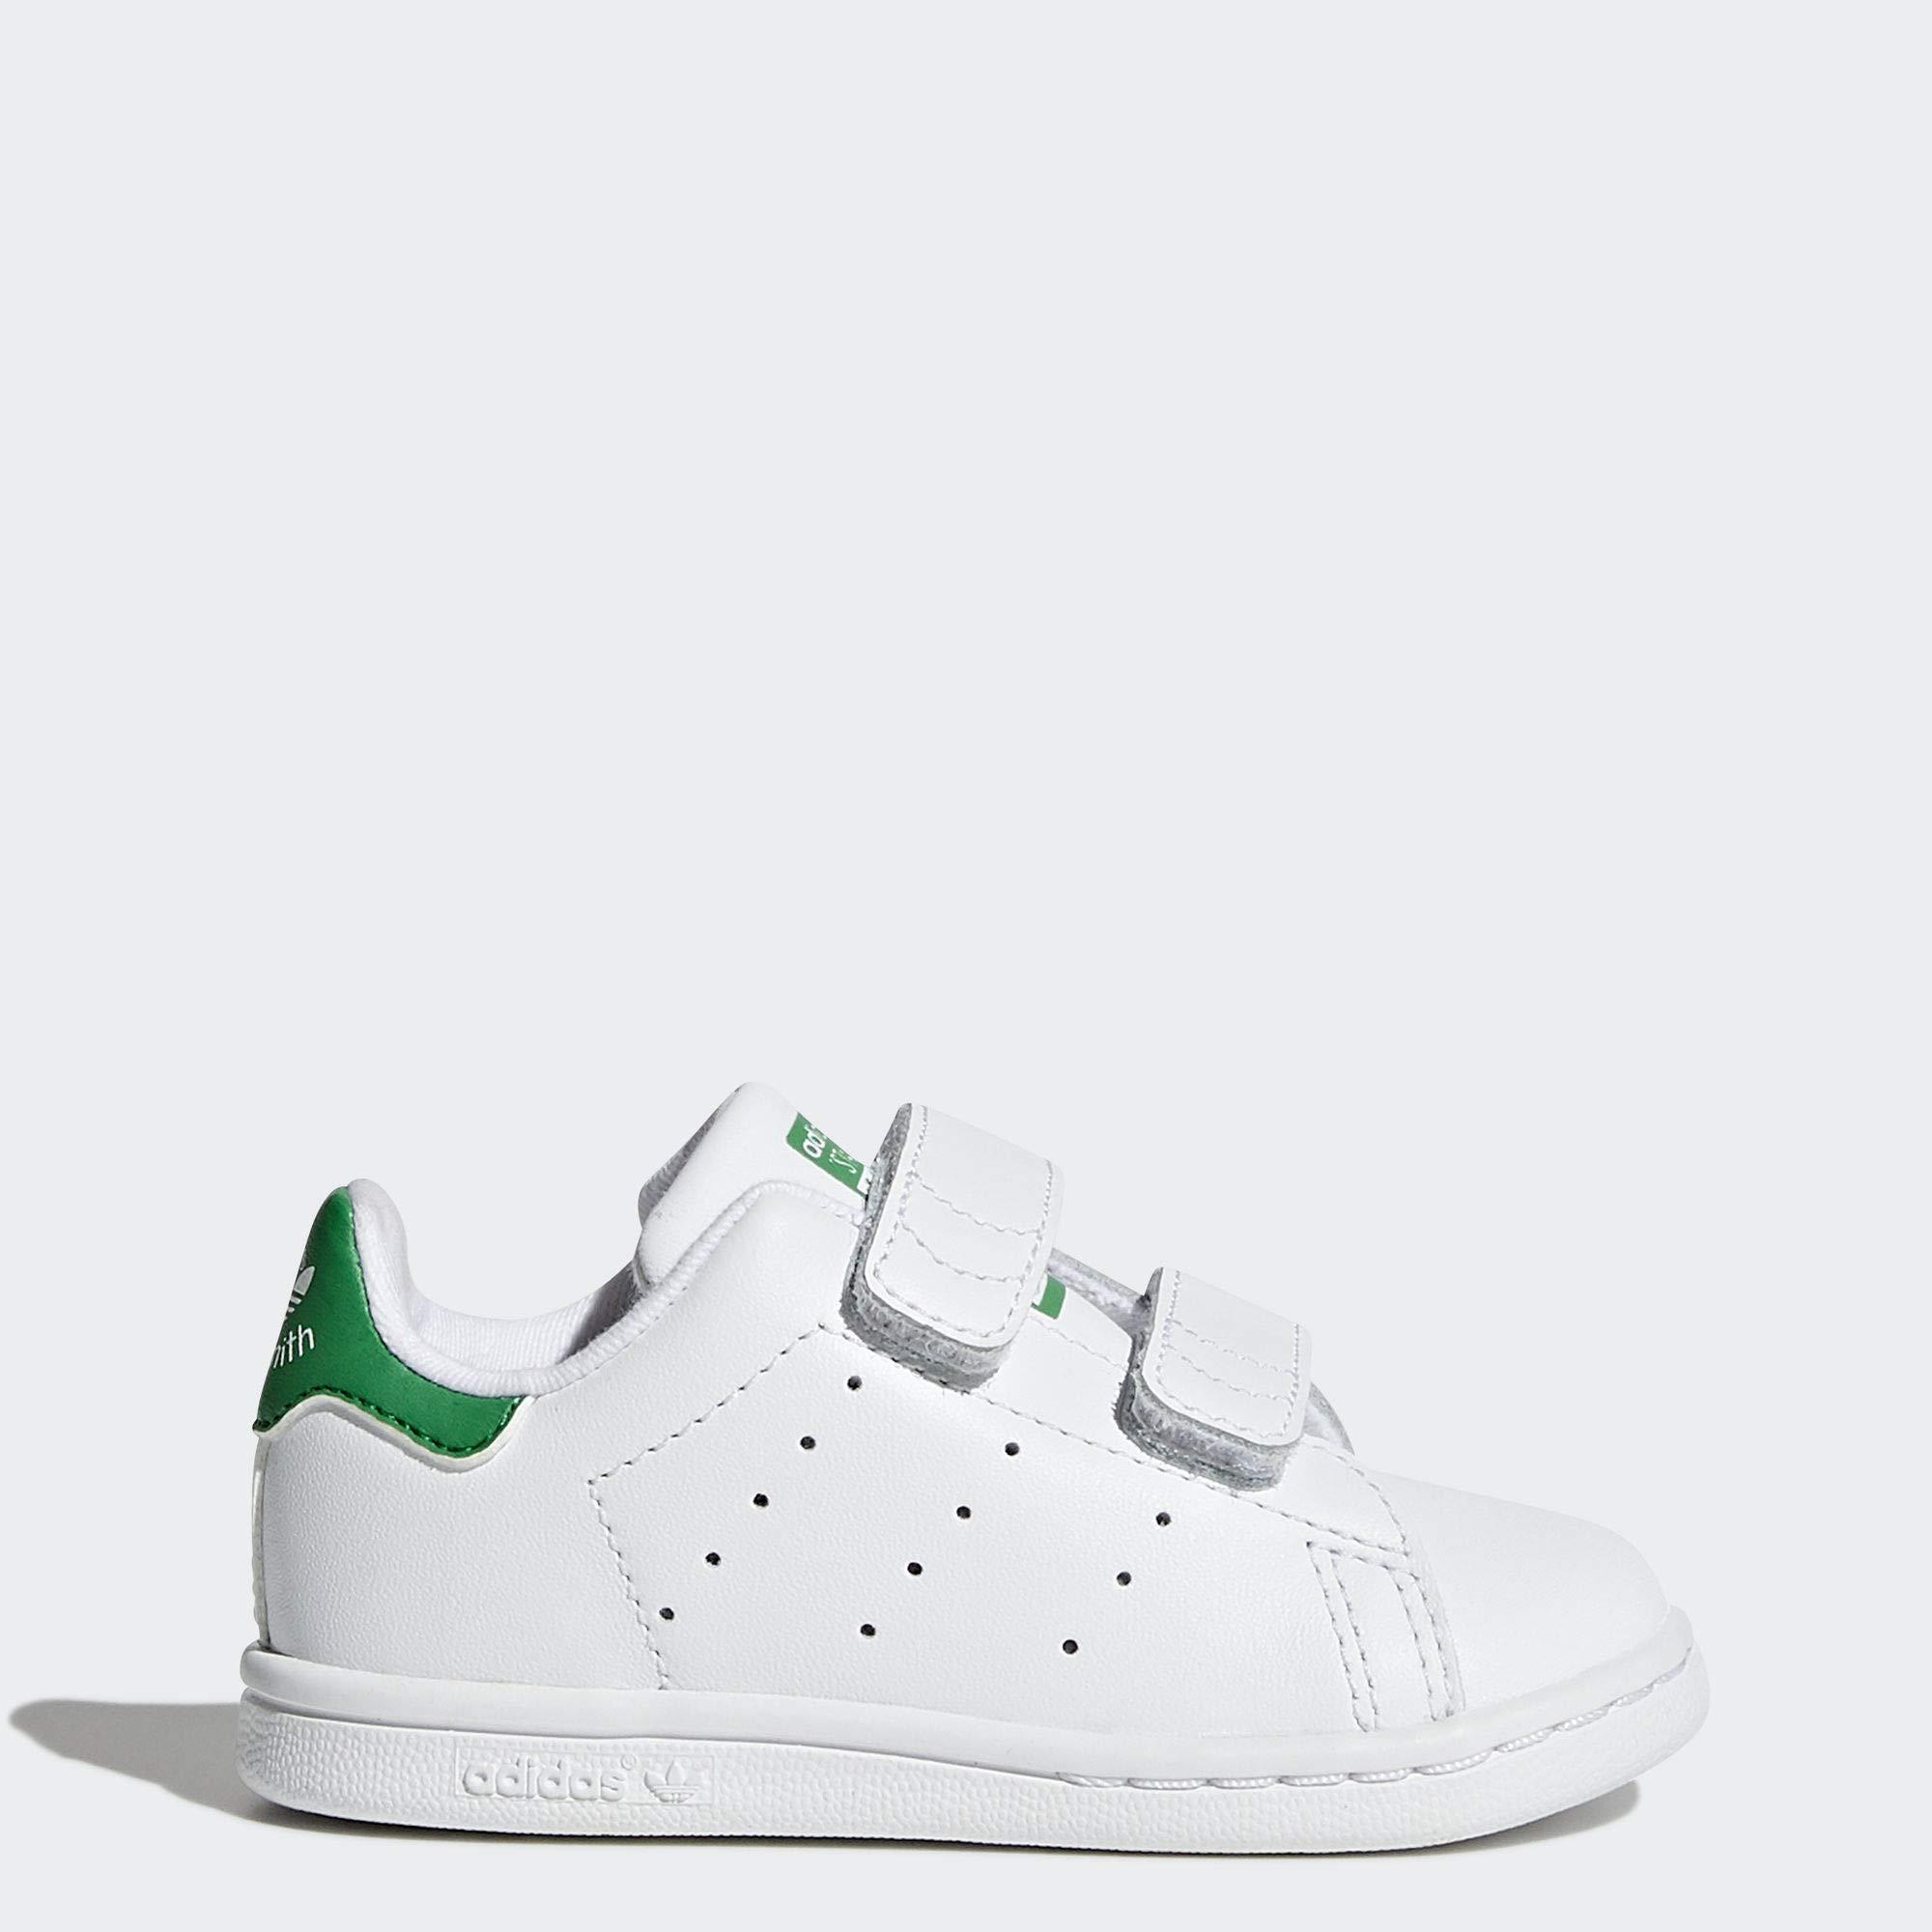 adidas Originals Baby Stan Smith Cloudfoam Sneaker, Footwear White/Footwear White/Green, 8.5 M US Toddler by adidas Originals